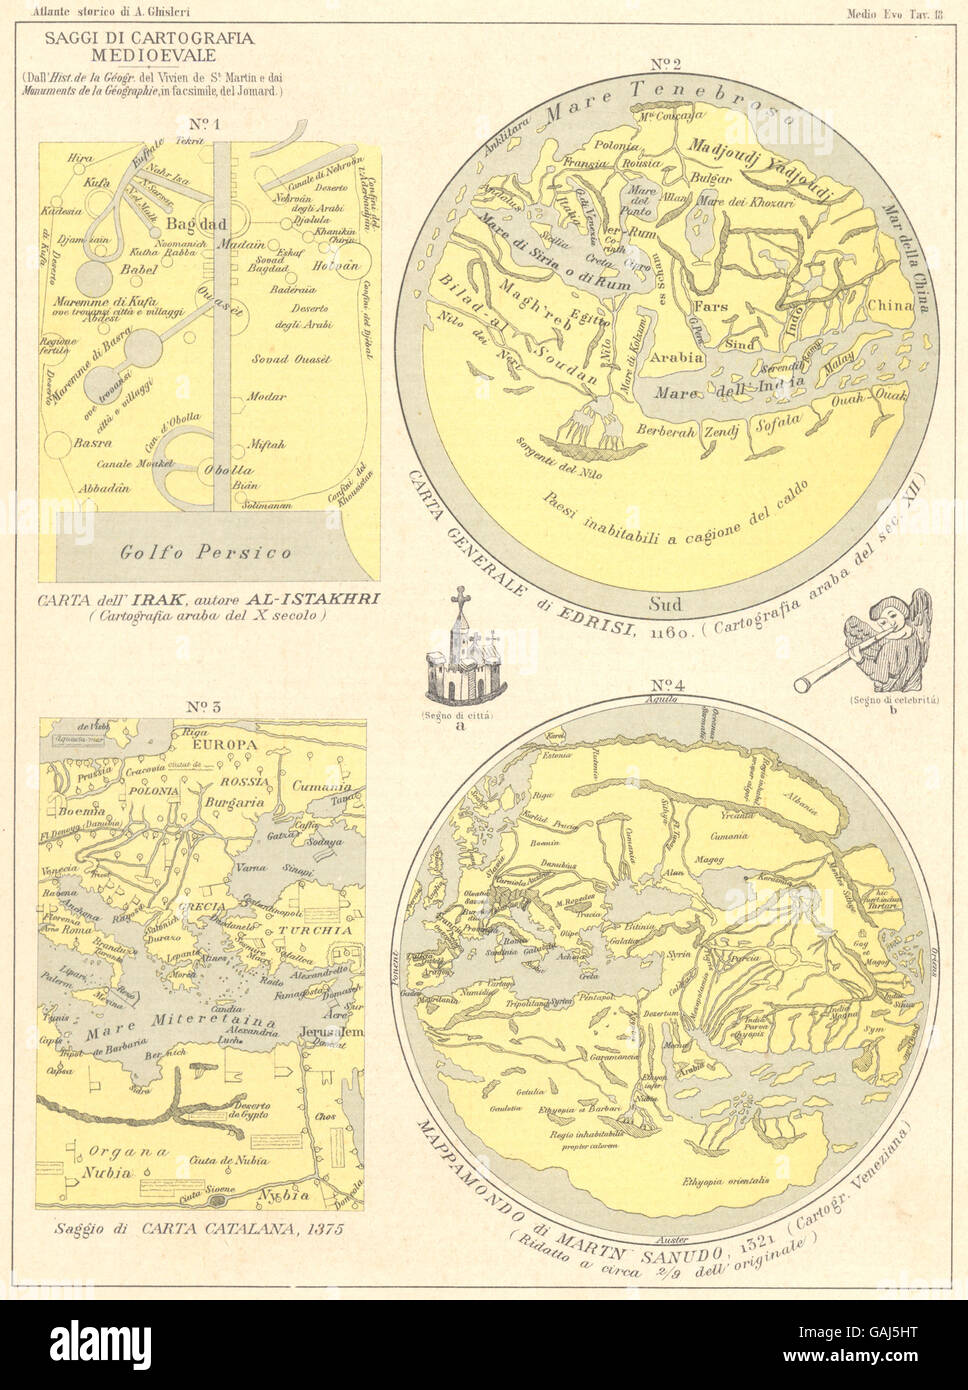 CARTOGRAFIA MEDIOEVALE: Irak Istakhri Edrisi Catalana Mappamondo Sanudo 1889 - Stock Image